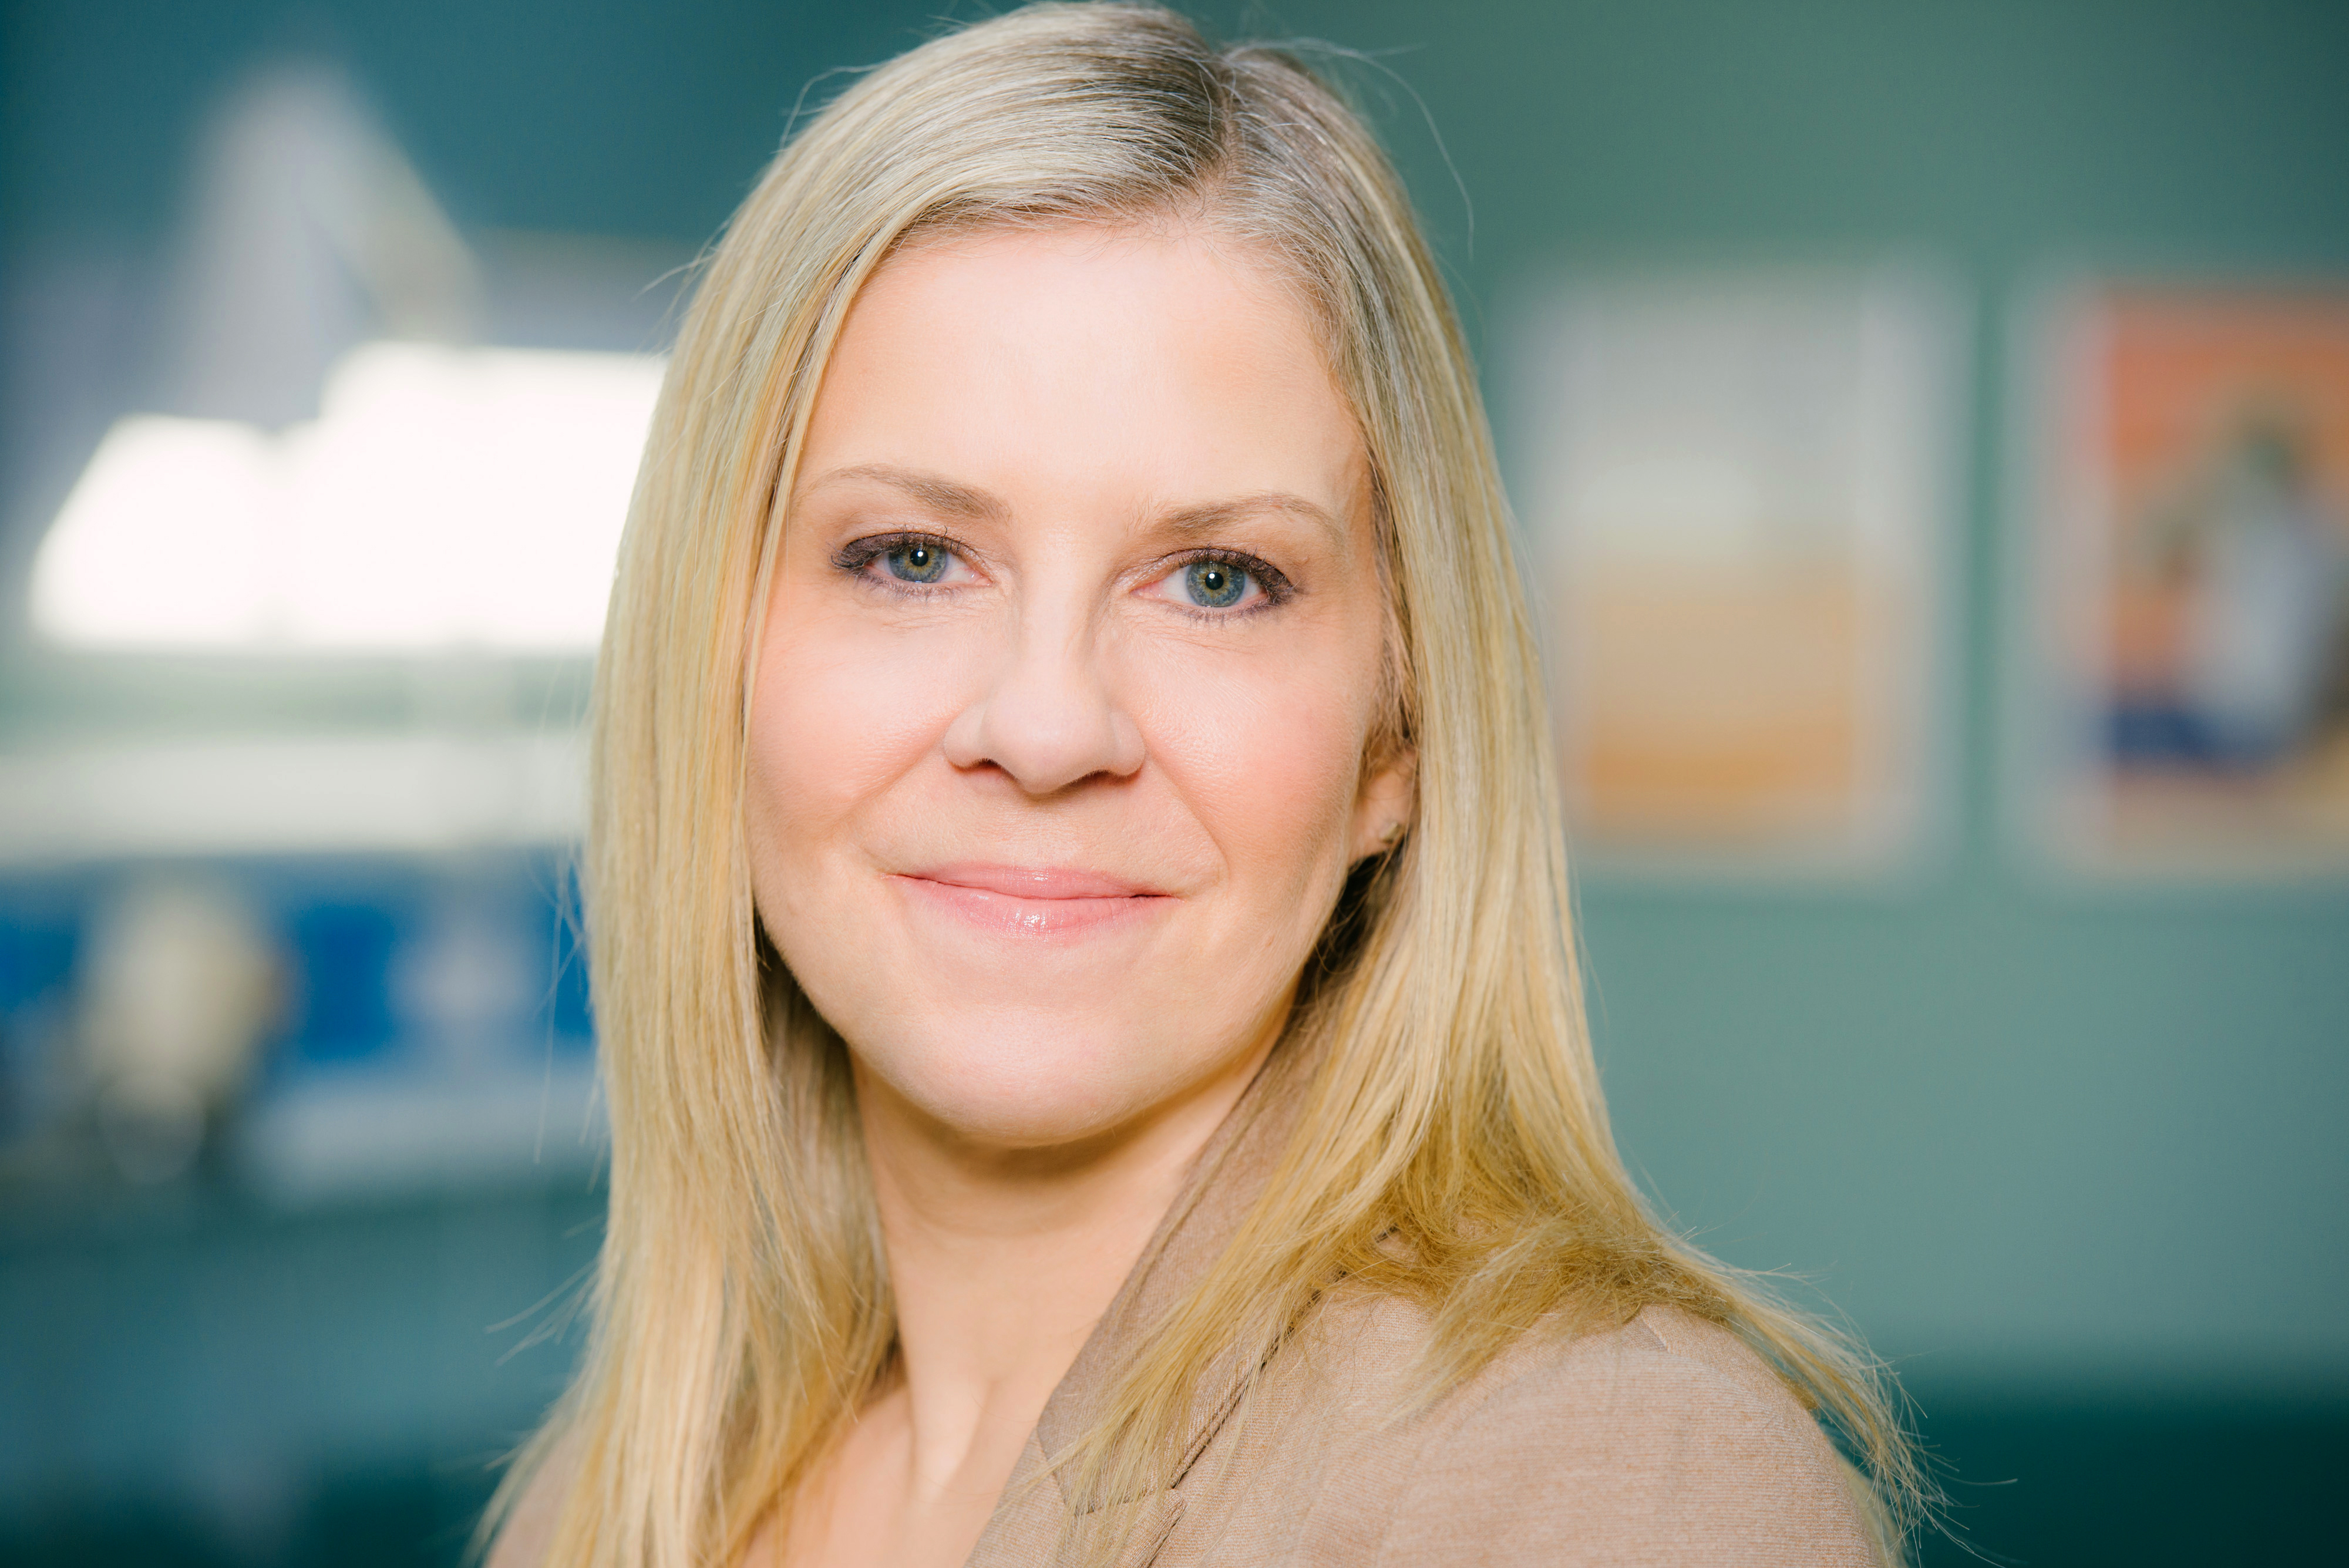 Casualty's series producer Erika Hossington